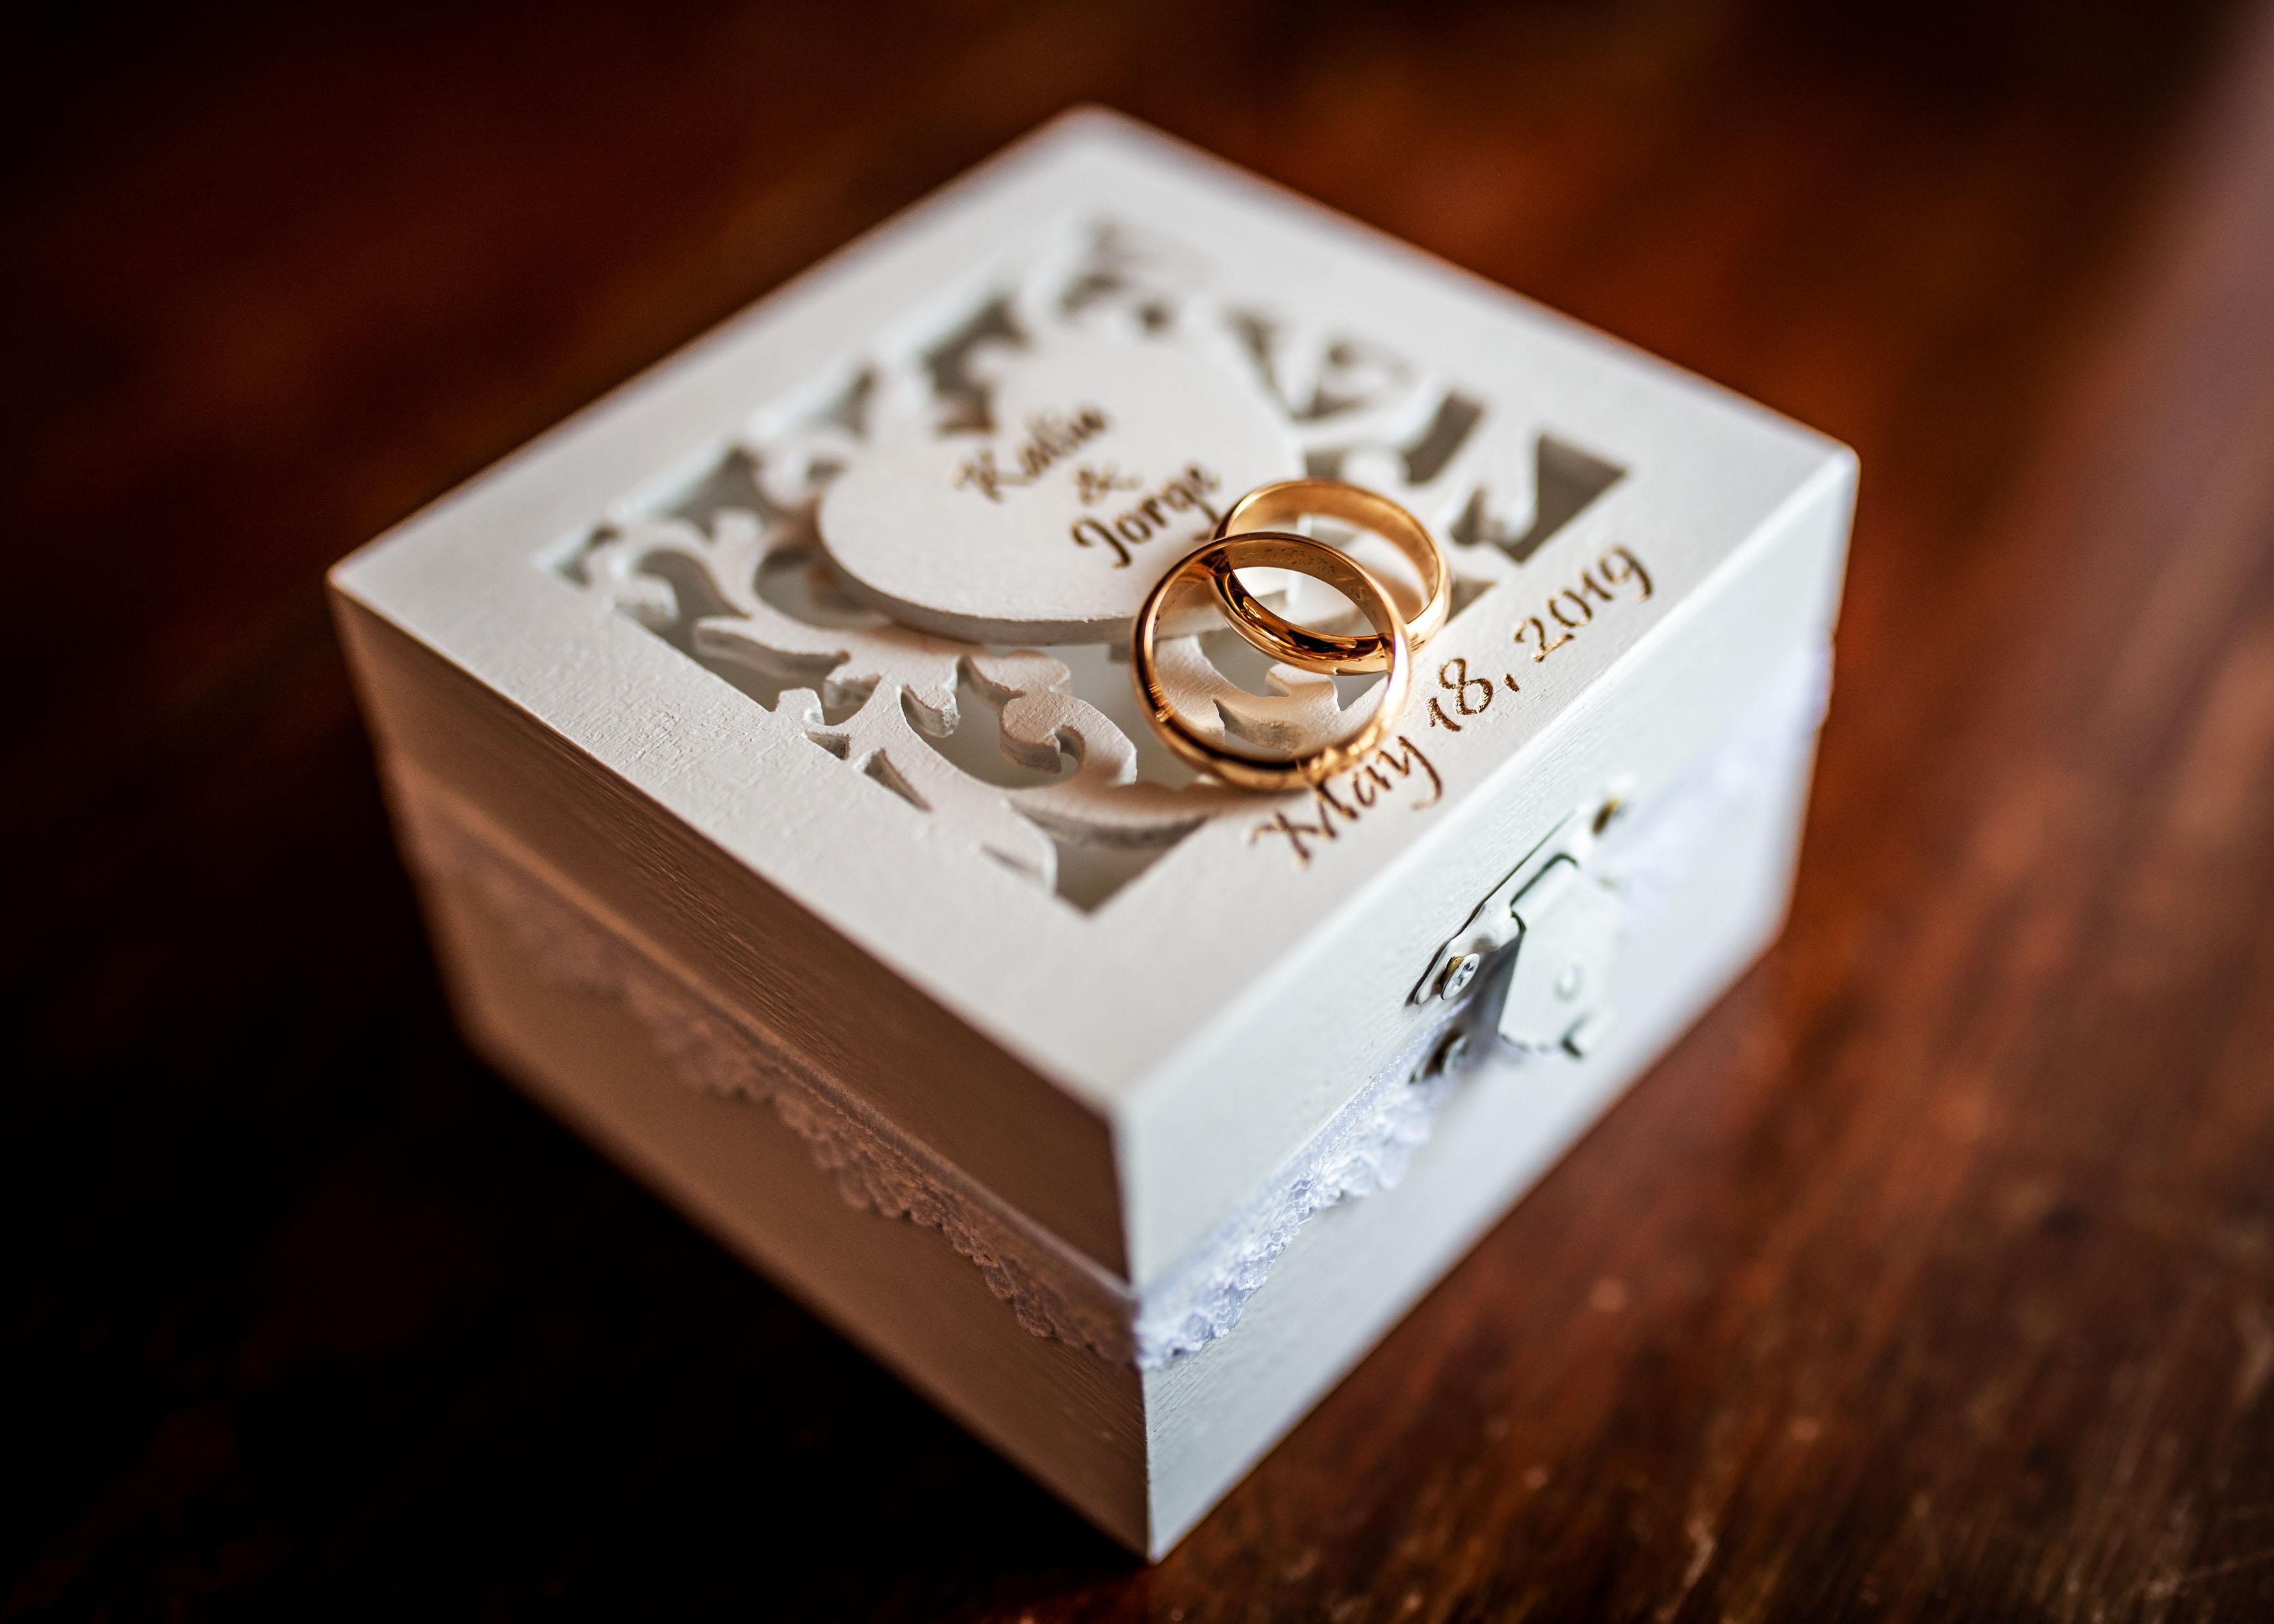 https://www.weddingamalfi.com/wp-content/uploads/Katia-Jorge-18-maggio-2019-9.jpg